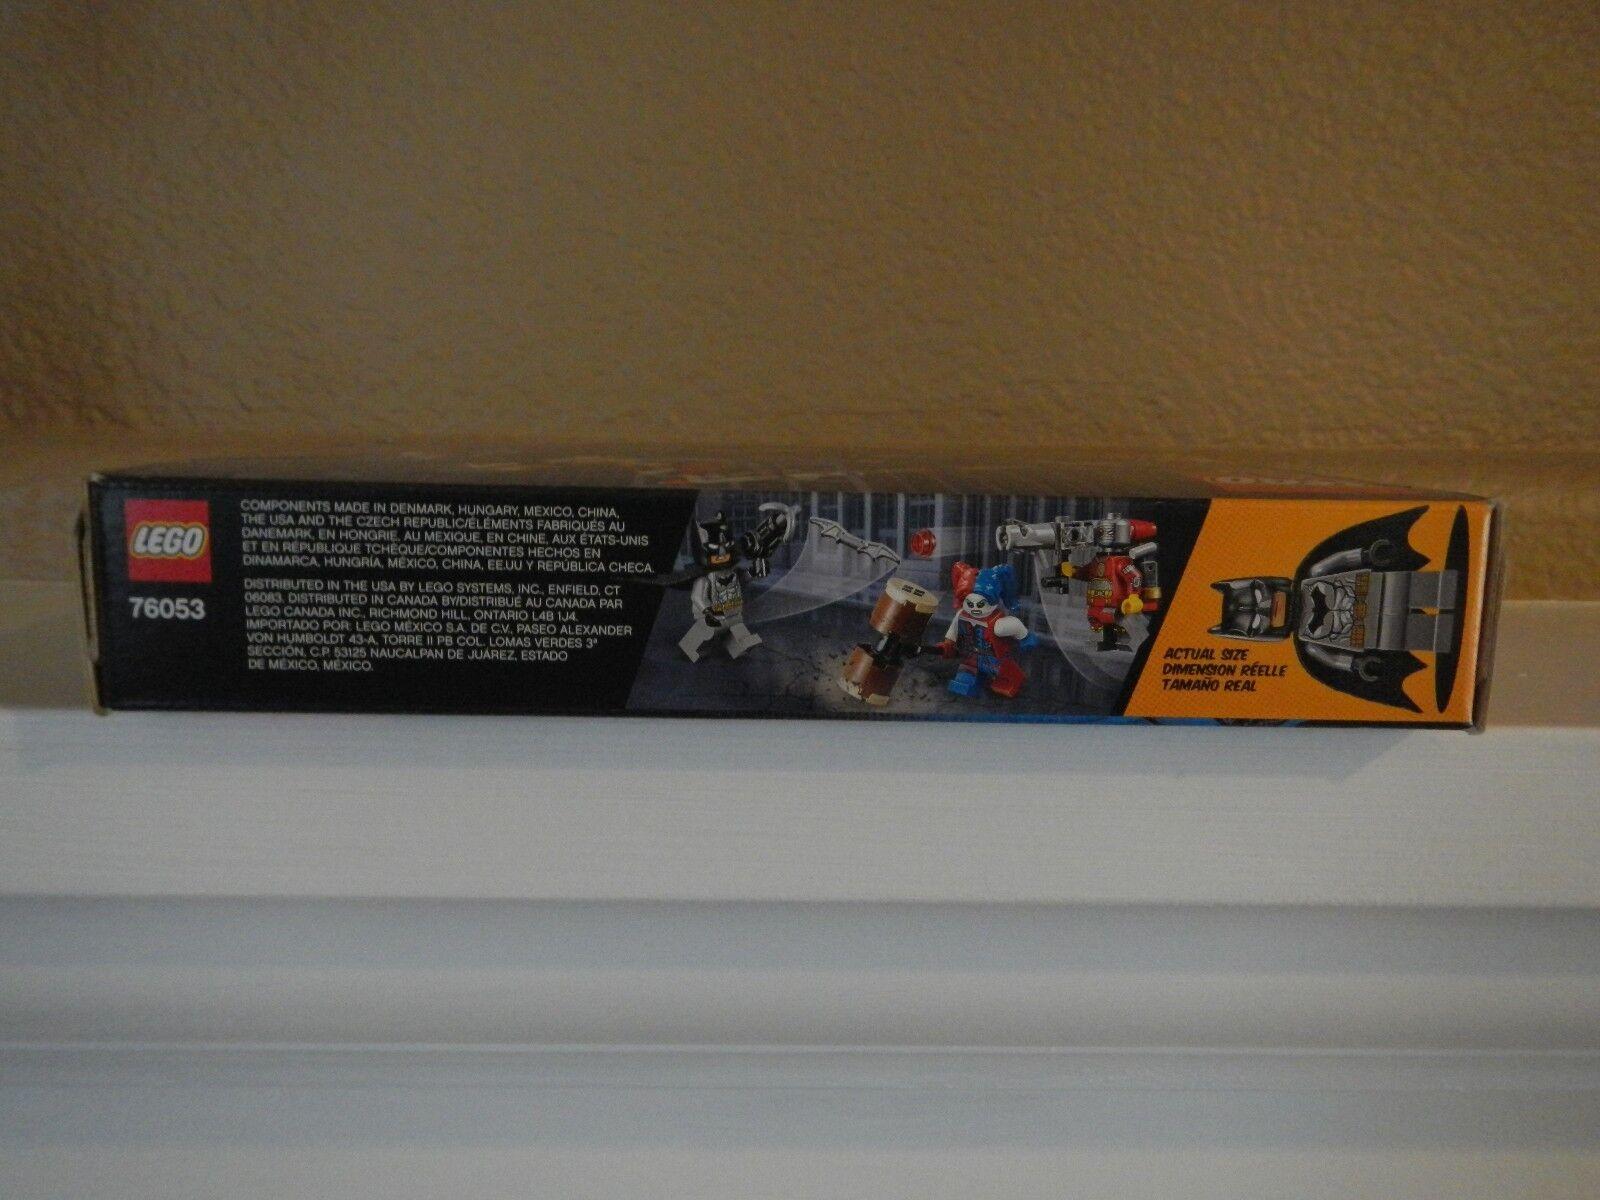 LEGO -NIB DC Comics Super Heroes Batman Gotham City City City Cycle Chase 12742d